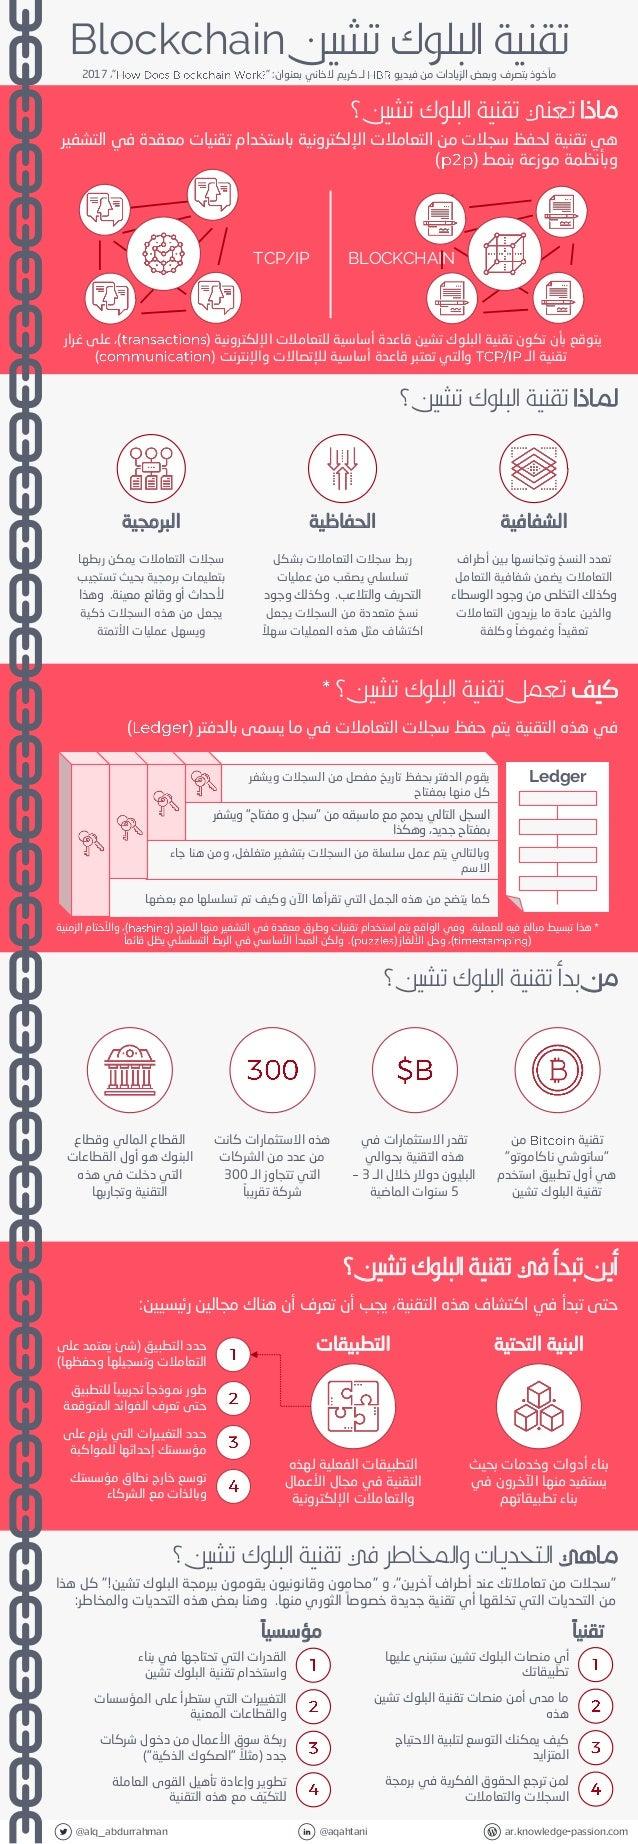 @alq_abdurrahman @aqahtani ar.knowledge-passion.com ماذا؟ تشين البلوك تقنية تعني هيتقنيةمن سجالت لحفظ...